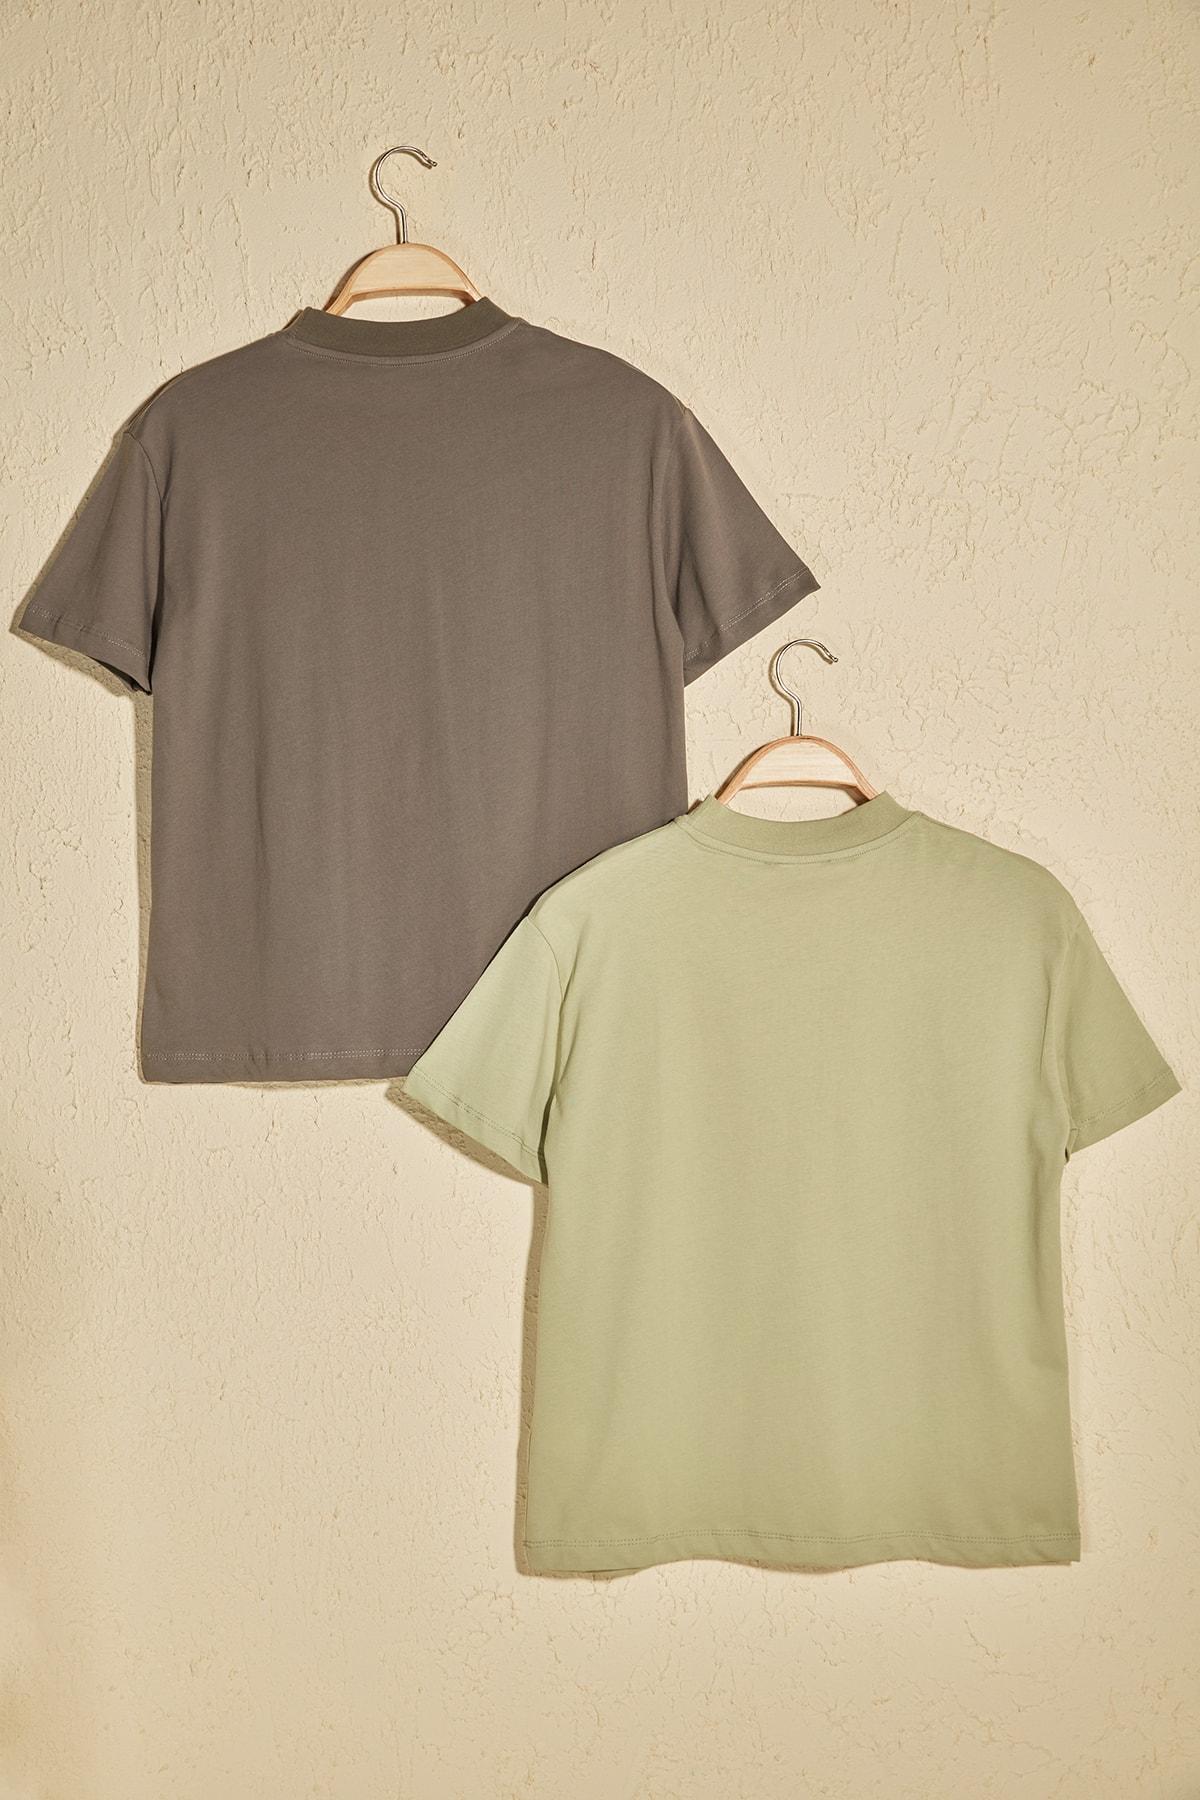 TRENDYOLMİLLA Mint Dik Yaka 2'li Paket Basic Örme Tshirt T-Shirt TWOSS20TS1500 1